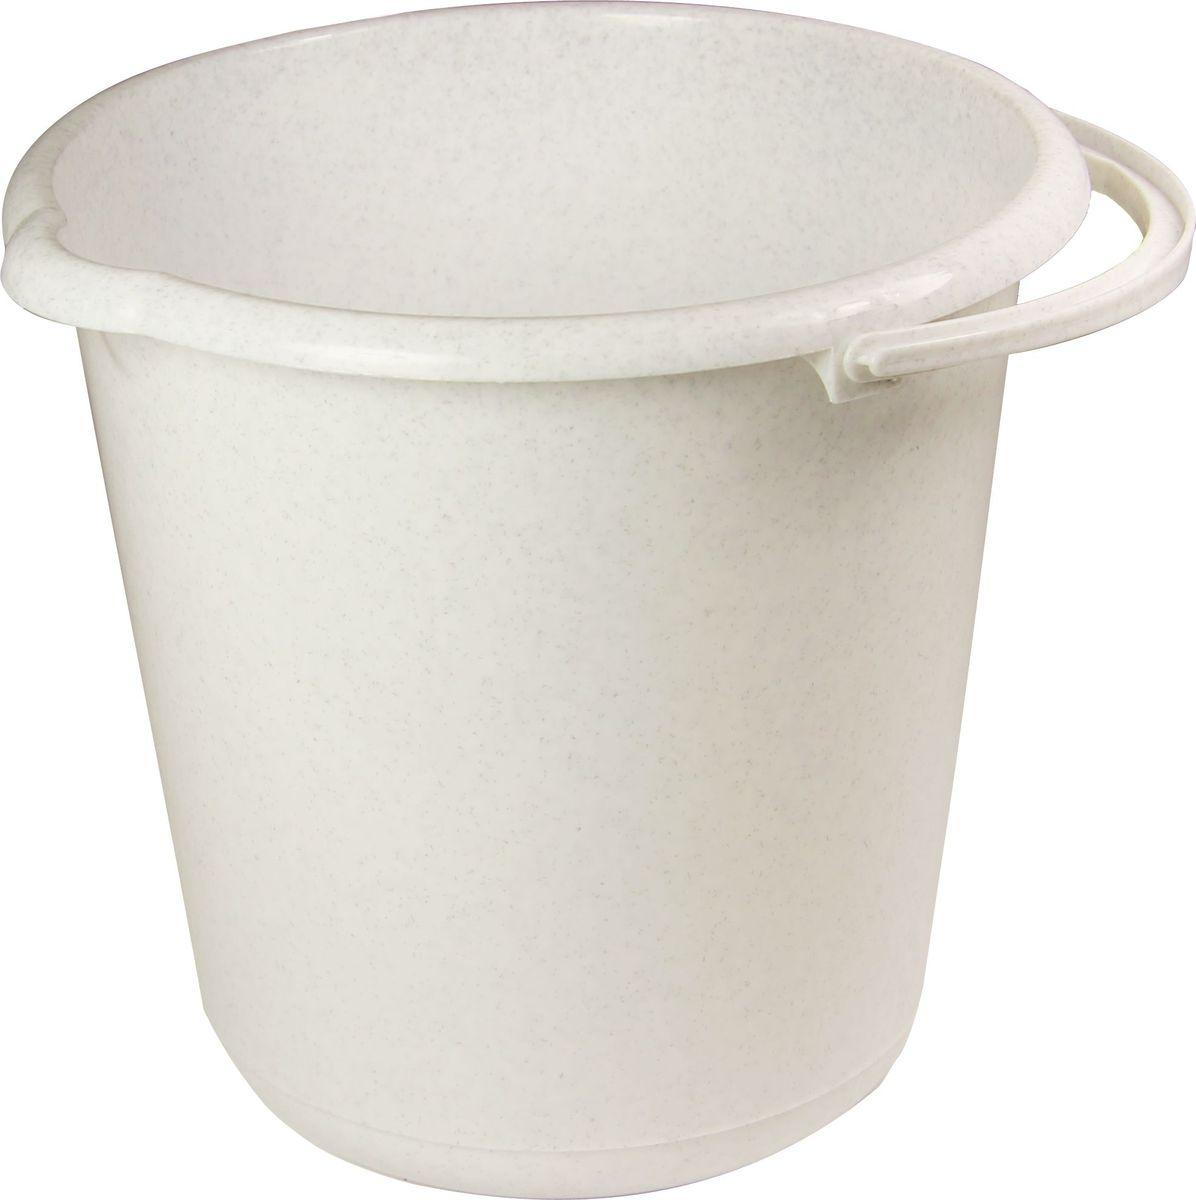 Ведро хозяйственное Idea, цвет: мраморный, 3 л ведро хозяйственное idea цвет мраморный 3 л